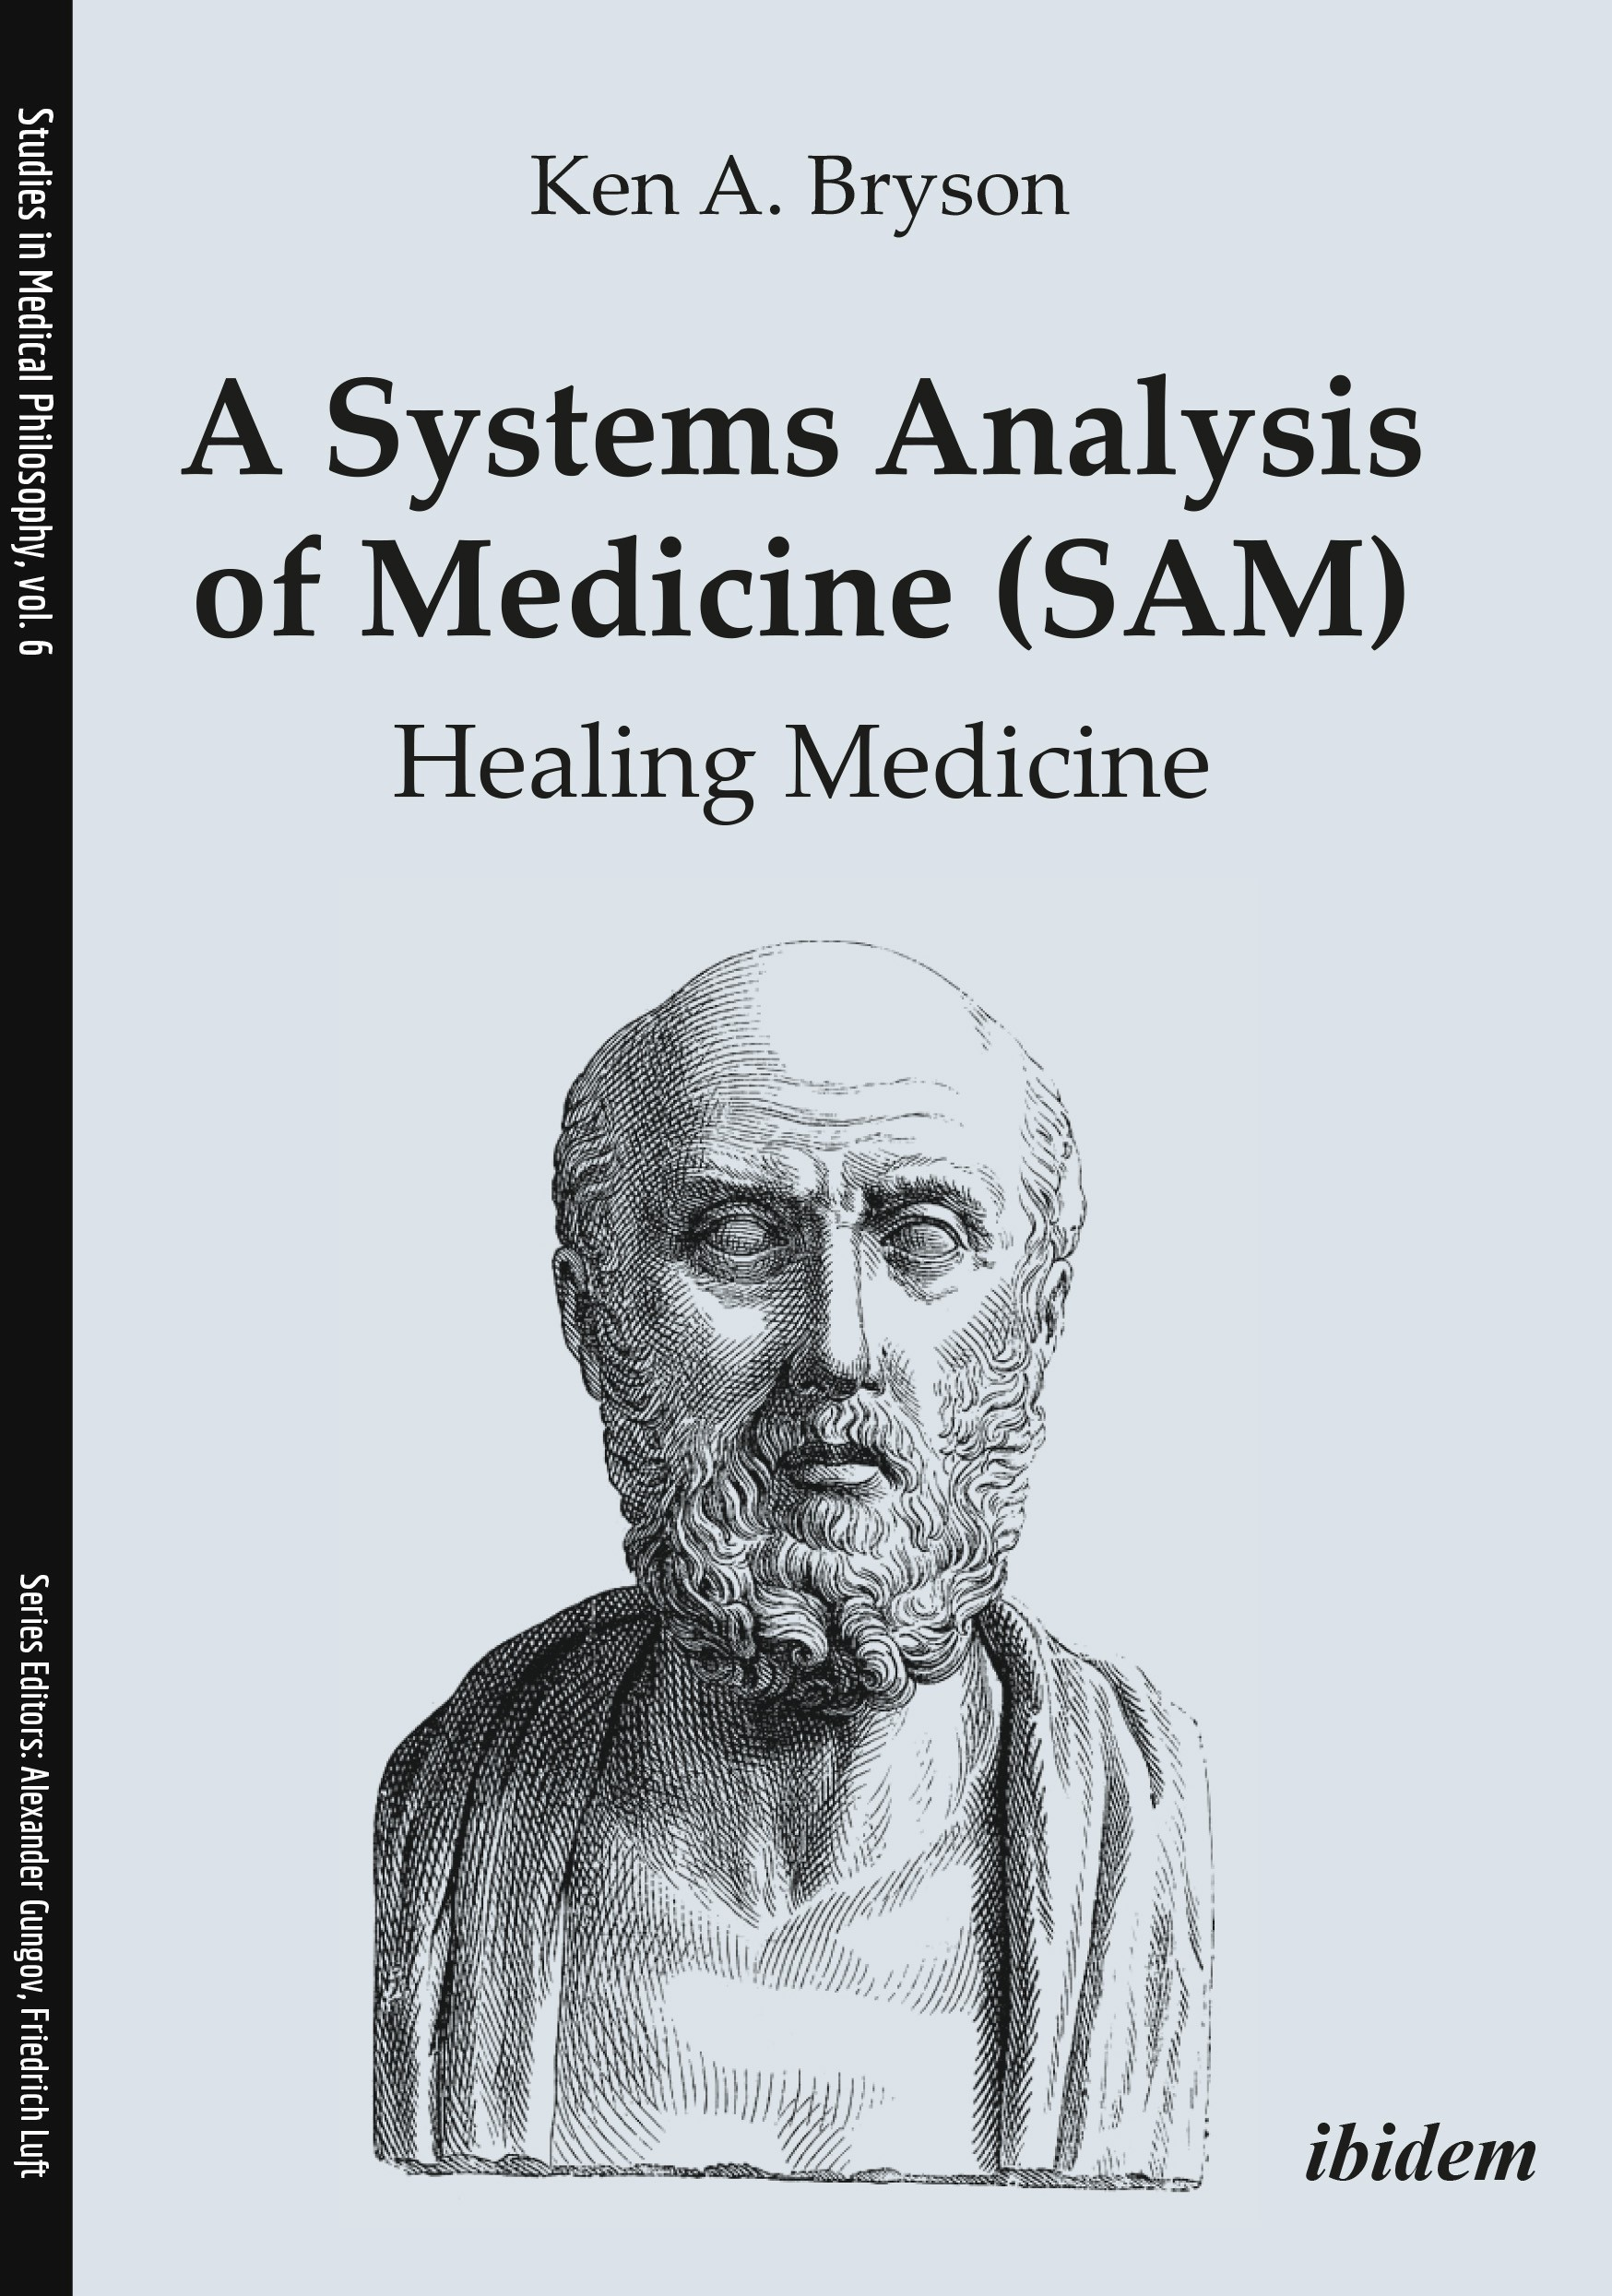 A Systems Analysis of Medicine (SAM): Healing Medicine